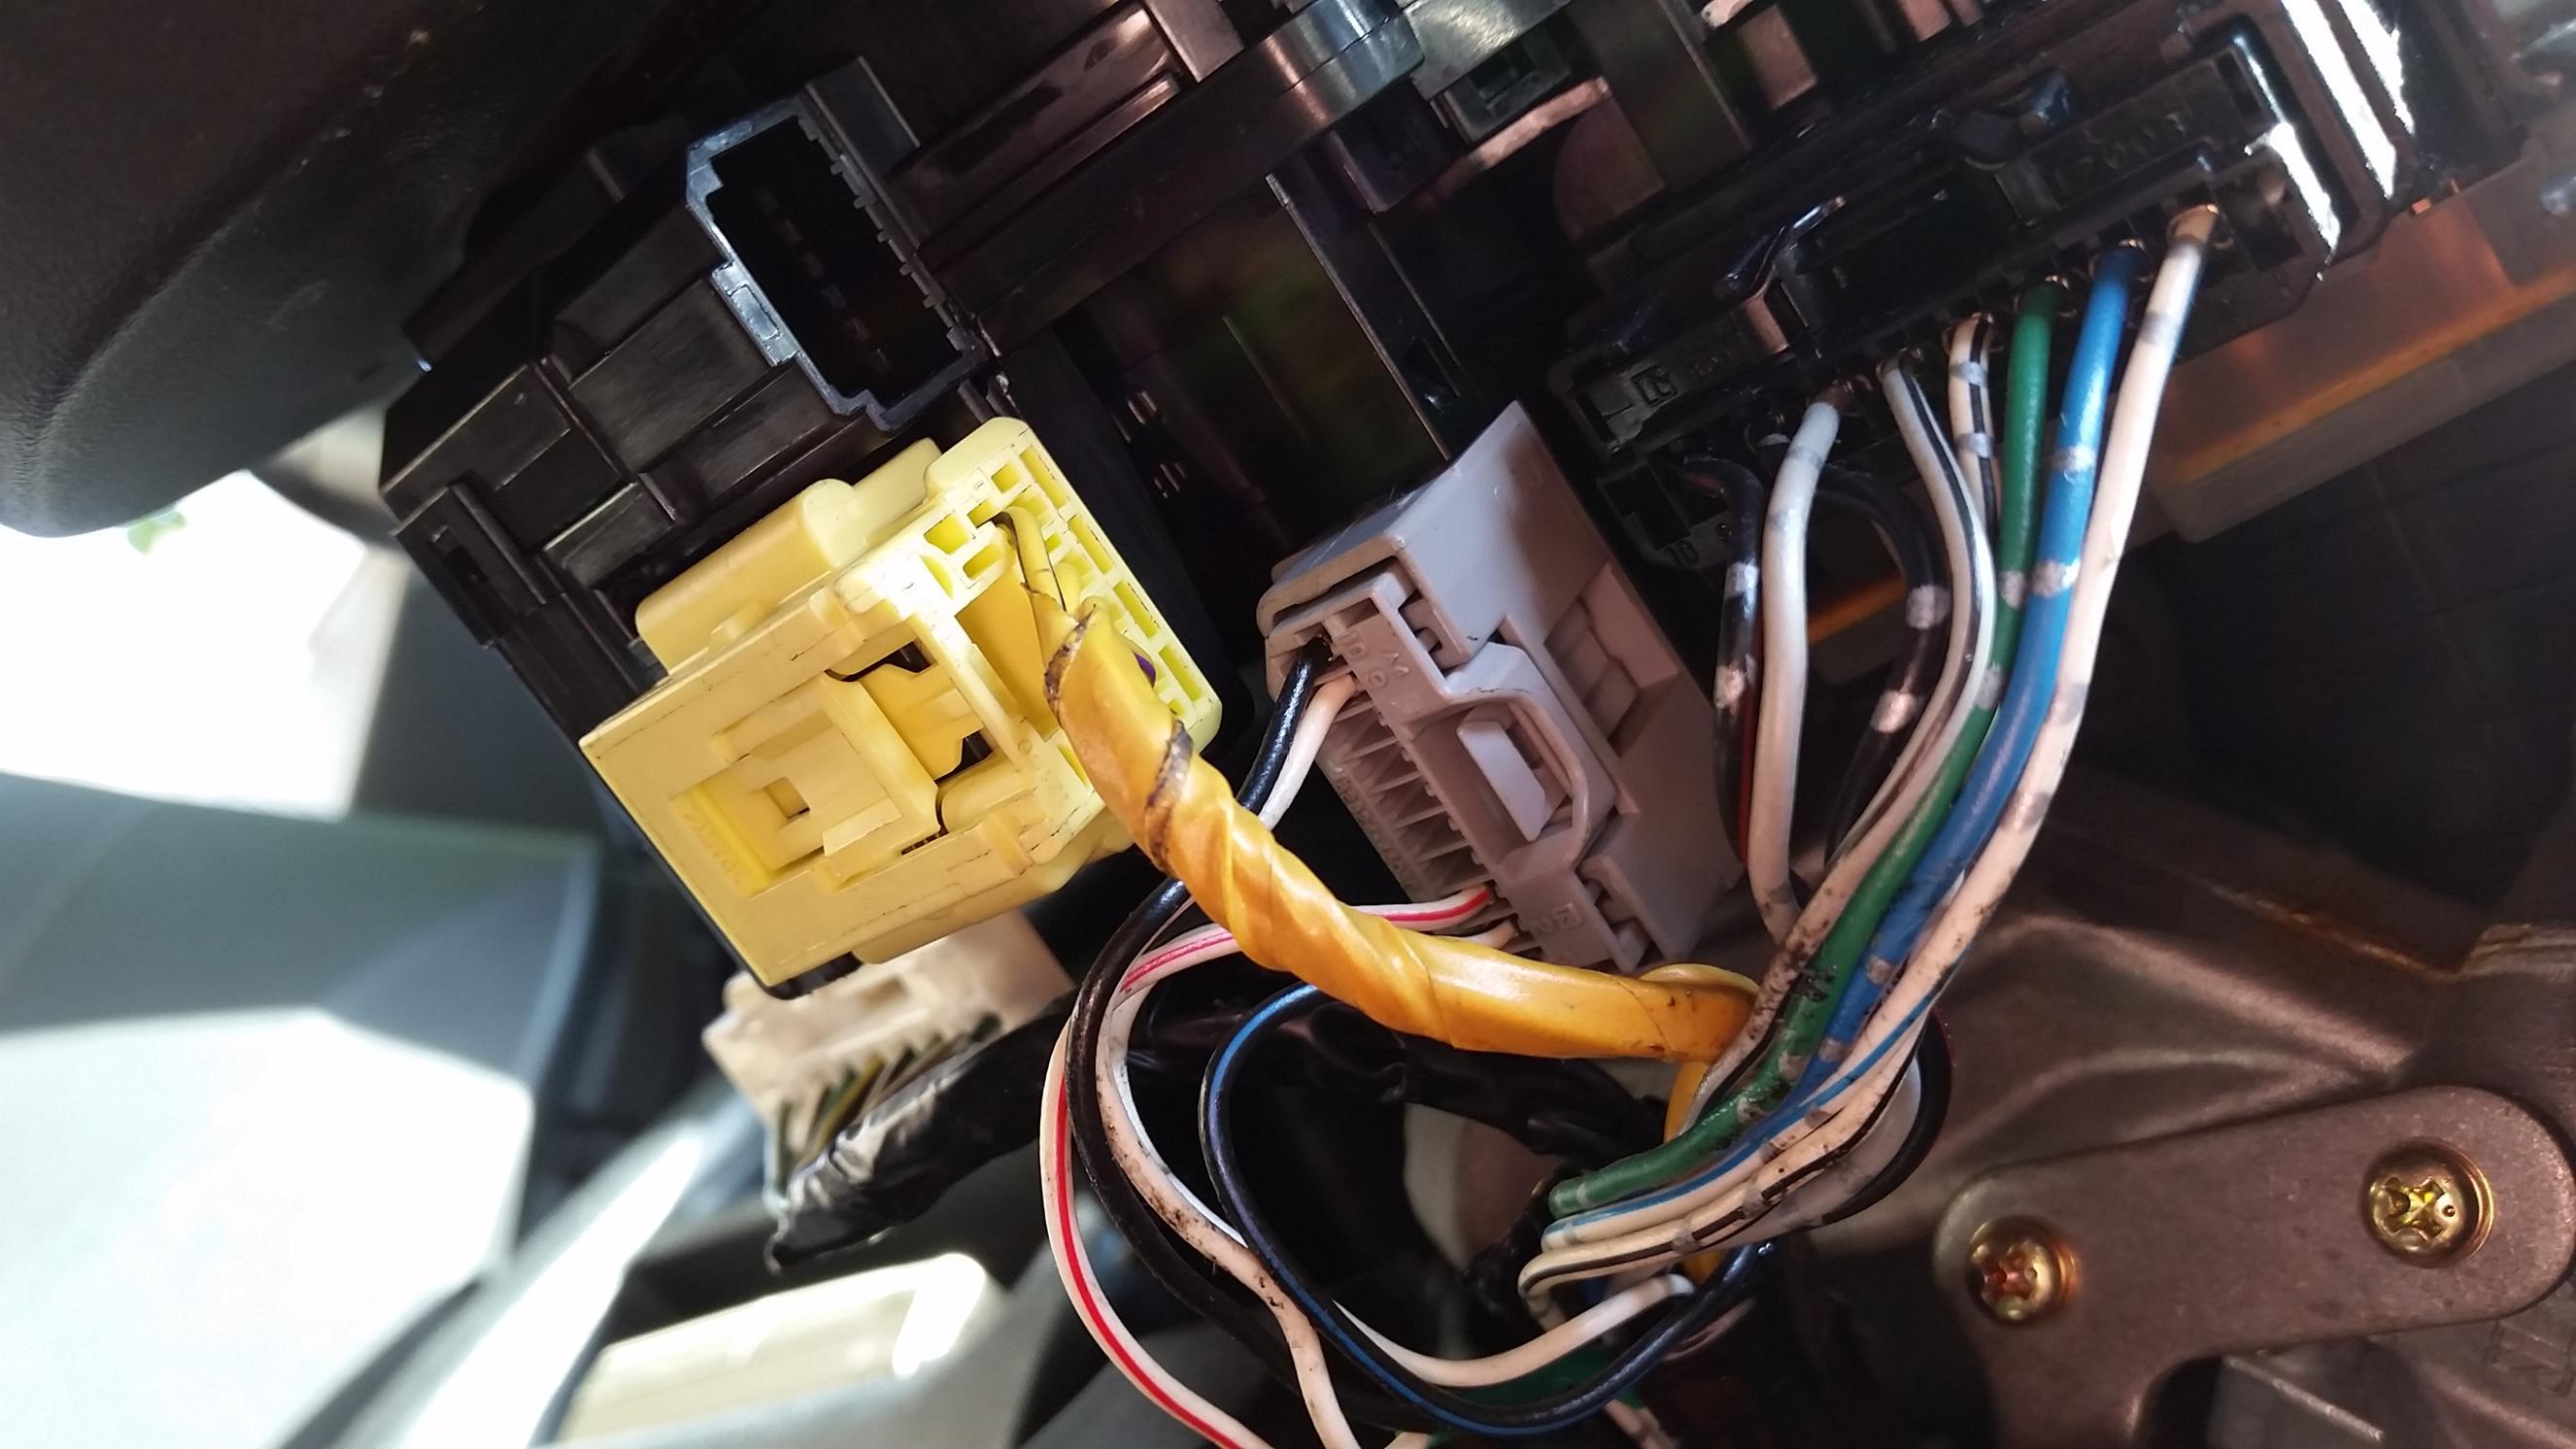 Steering Column Horn Wiring Trusted Schematics Diagram 1958 Chevrolet In Scion Xb Forum Gm